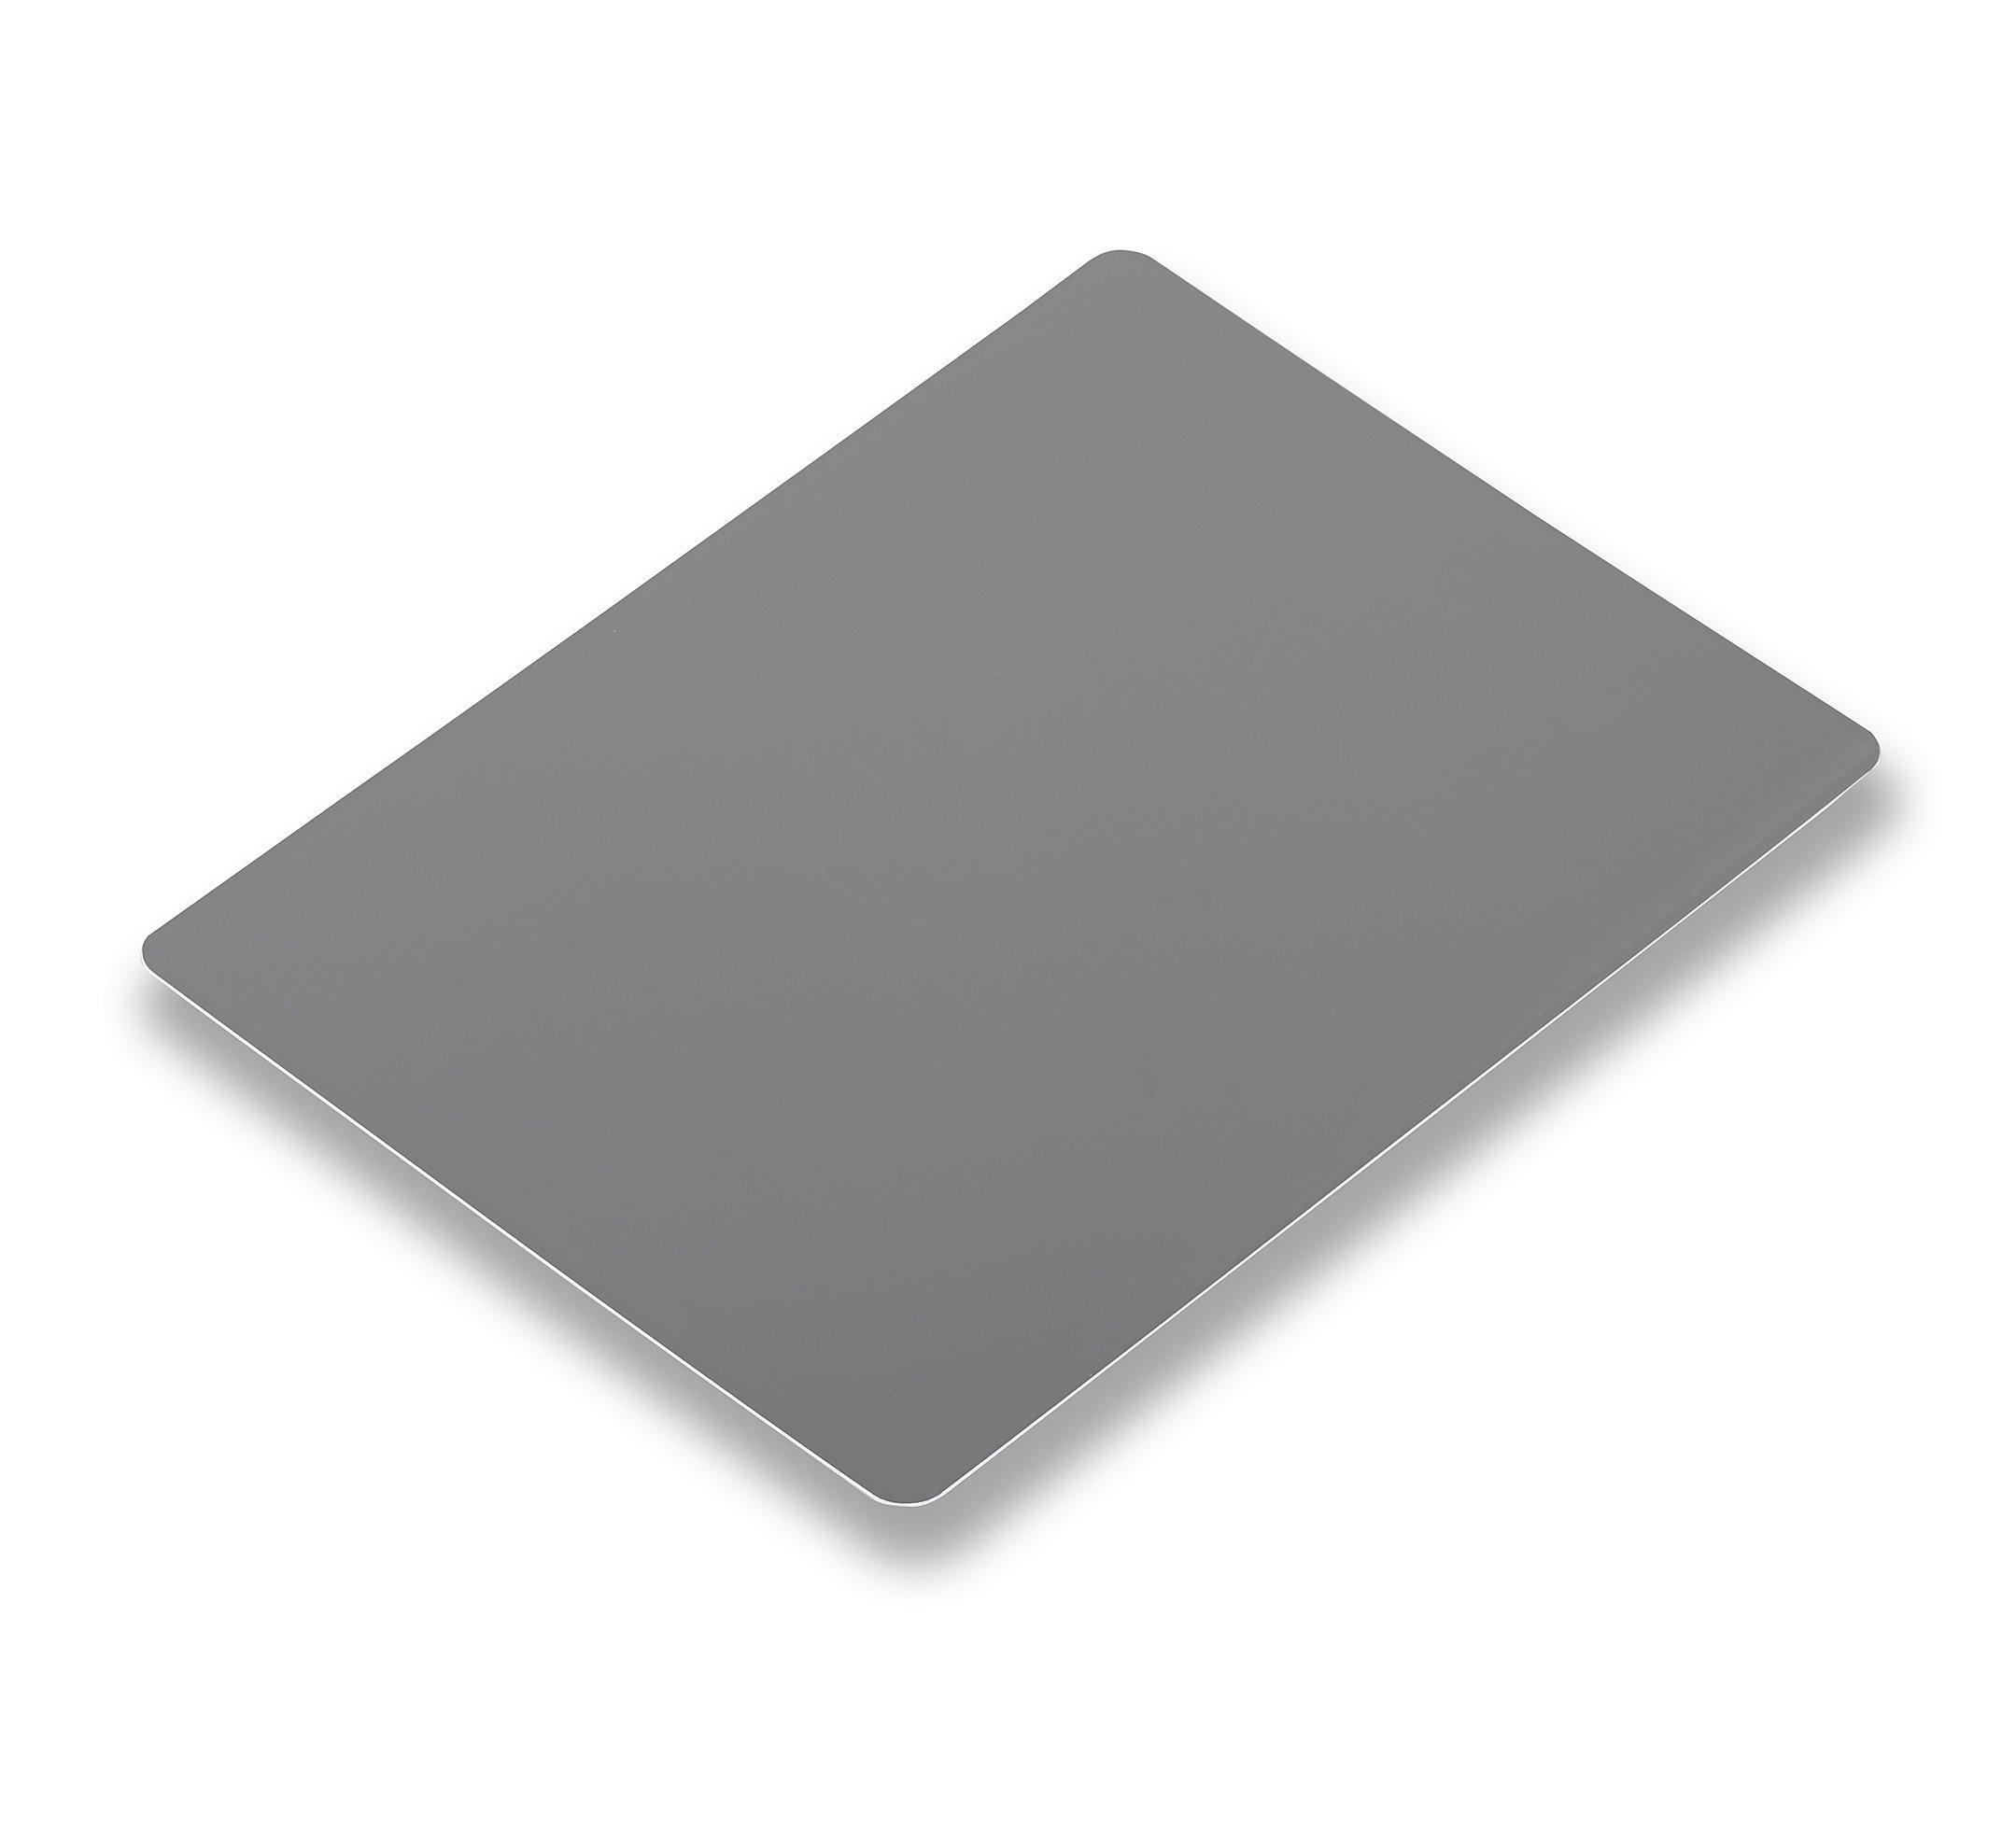 Novoflex 9x8'' Grey/White Card for Manual White Balance/Exposure (ZEBRA)